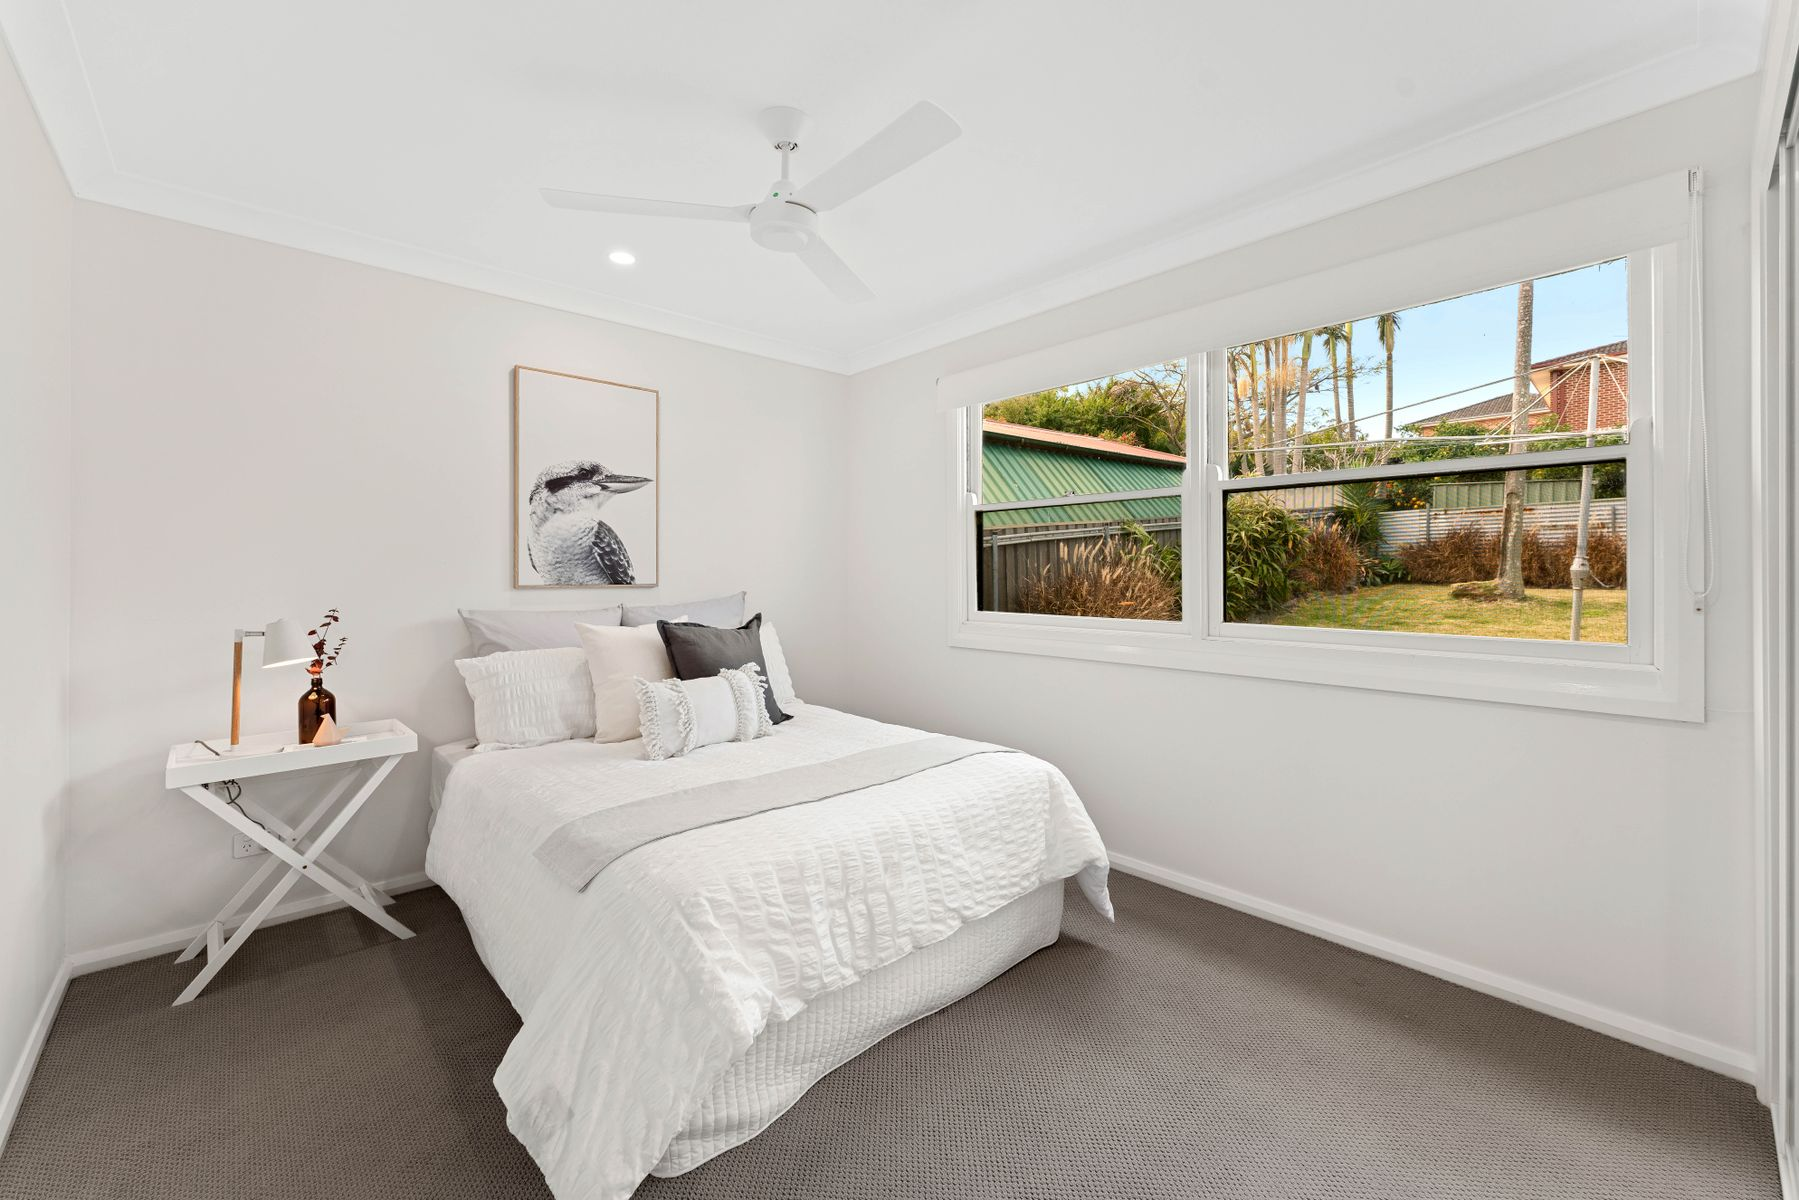 52 John Fisher Road, Belmont North, NSW 2280